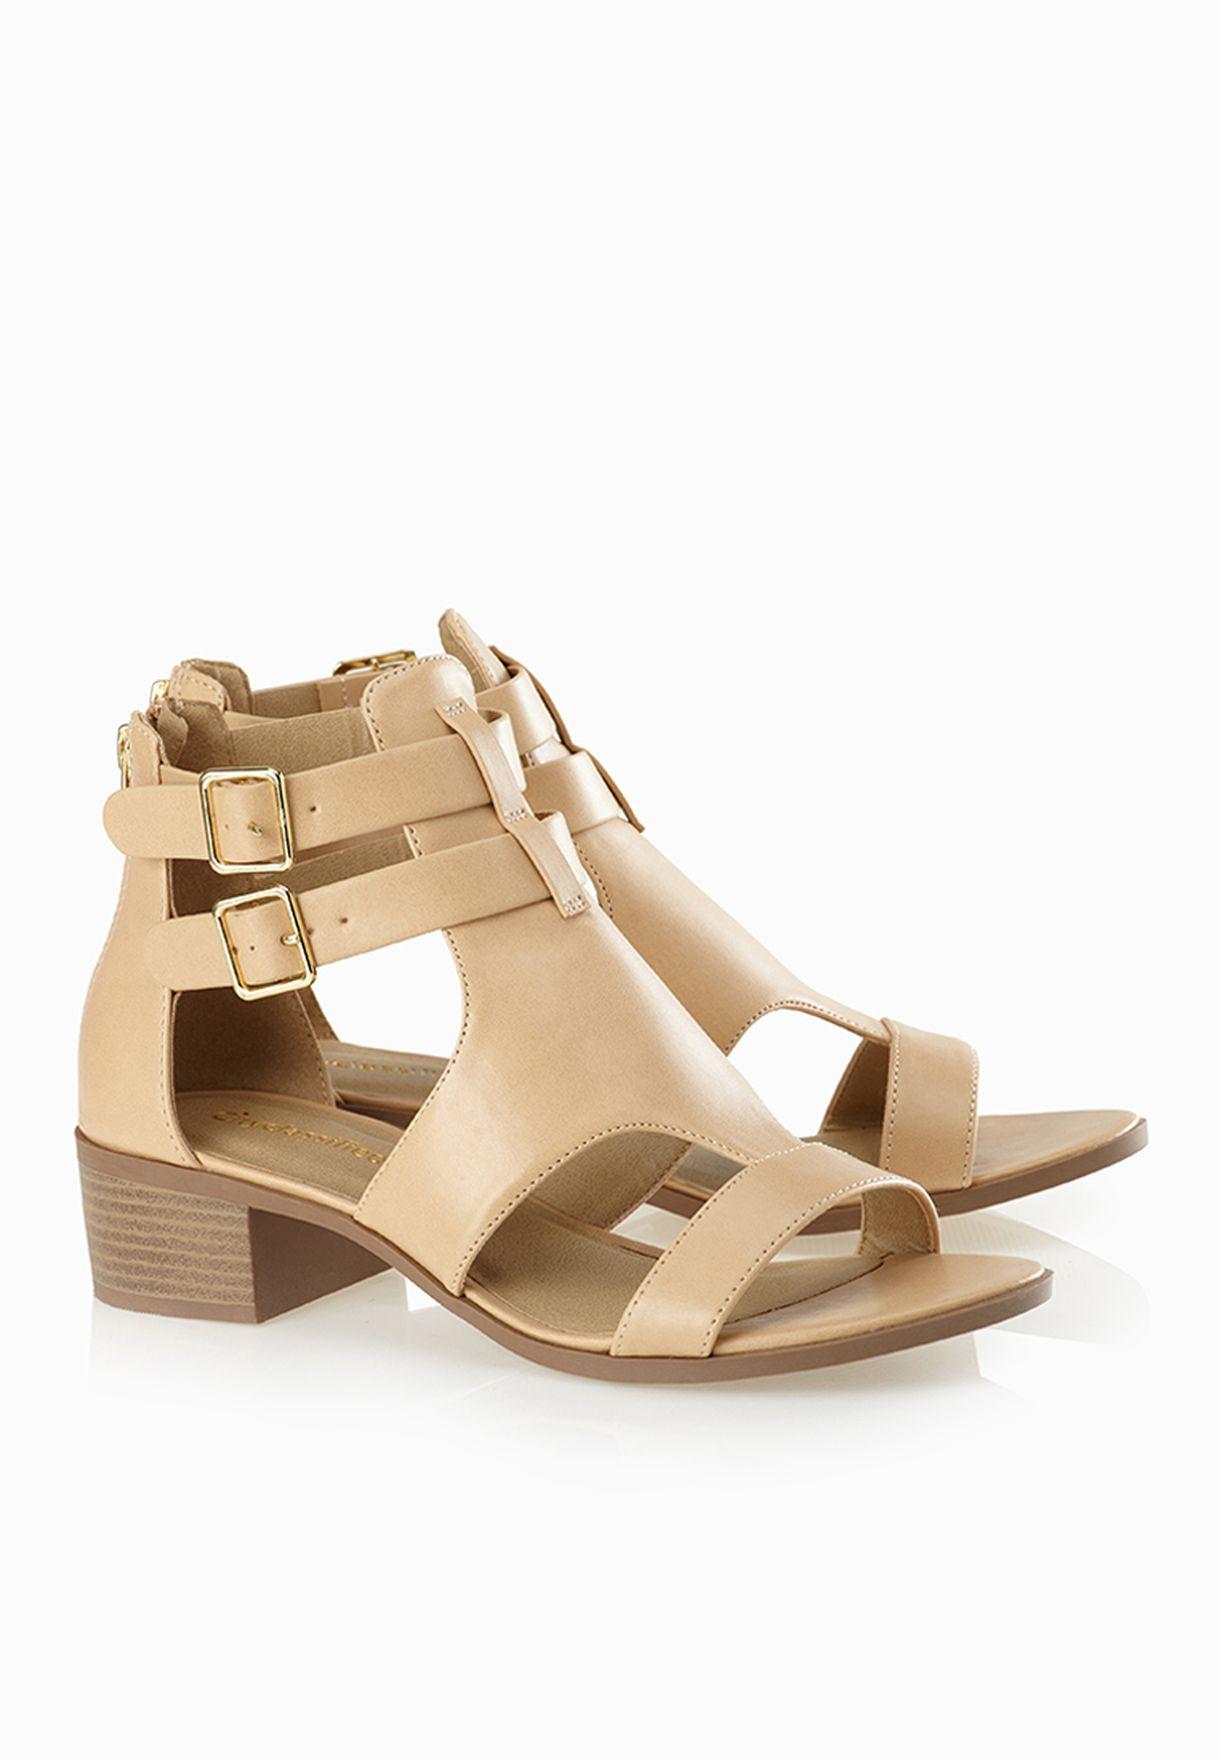 Cruz Sandals